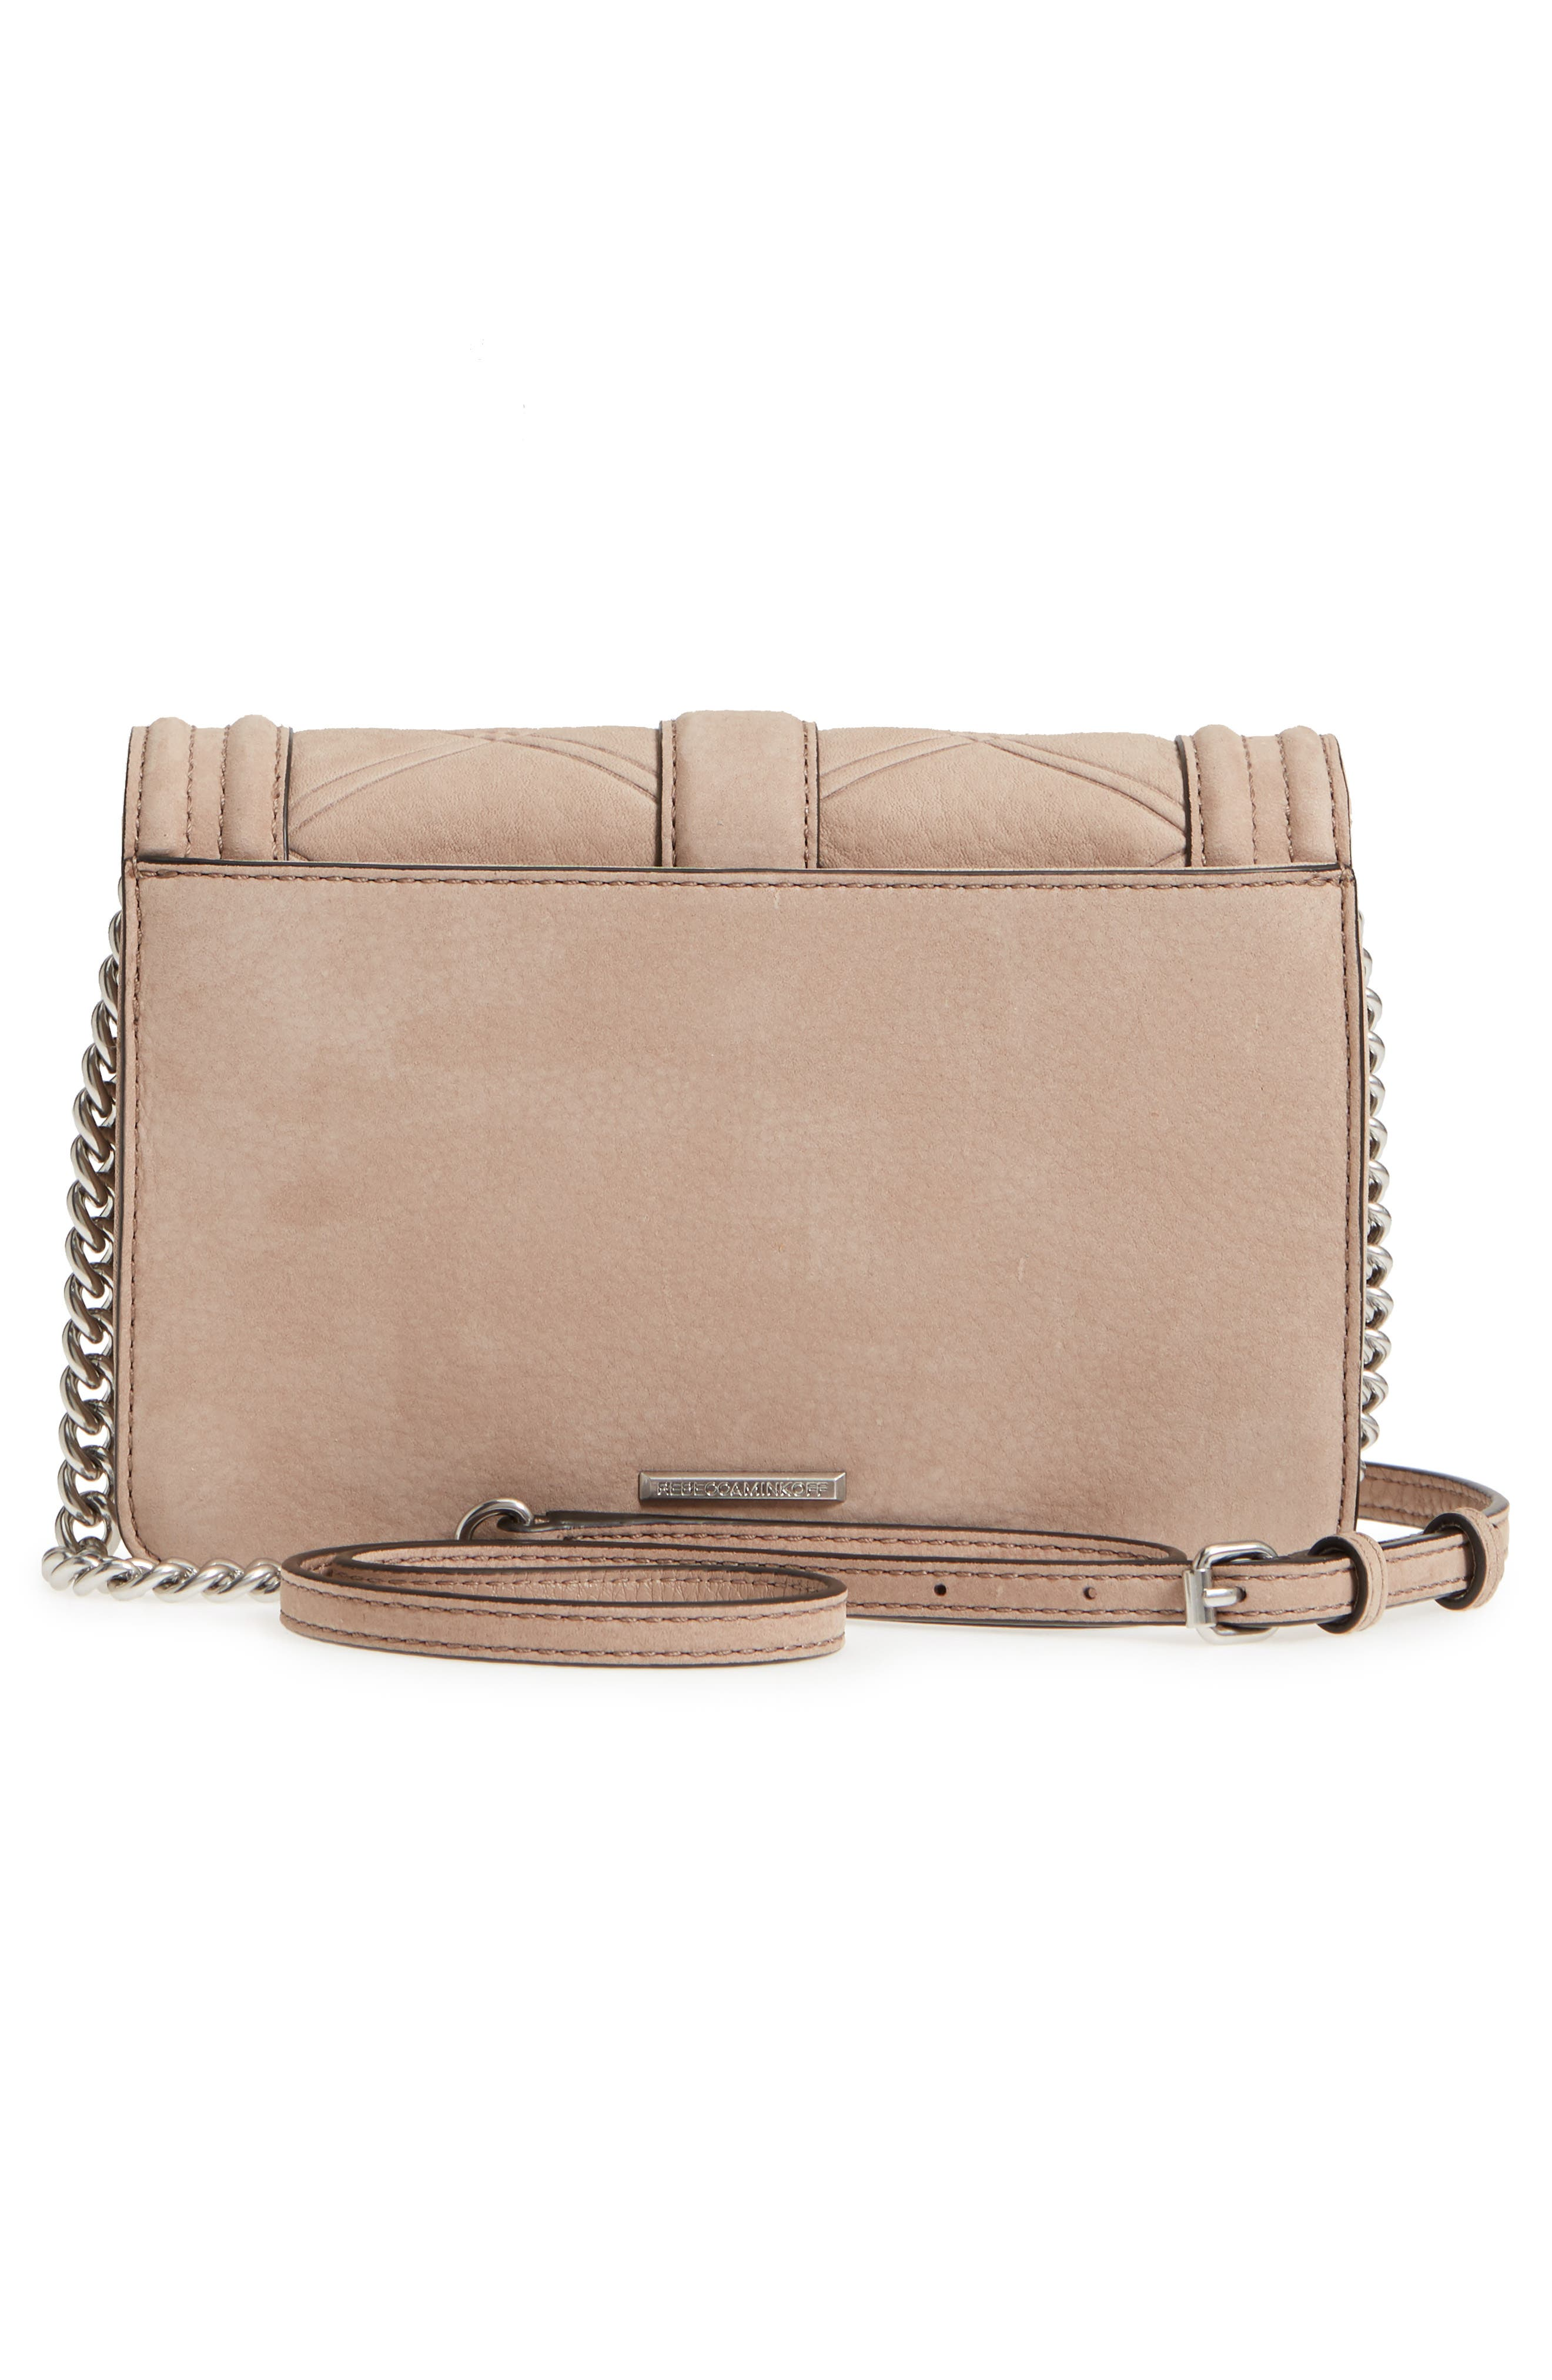 Small Love Nubuck Leather Crossbody Bag,                             Alternate thumbnail 12, color,